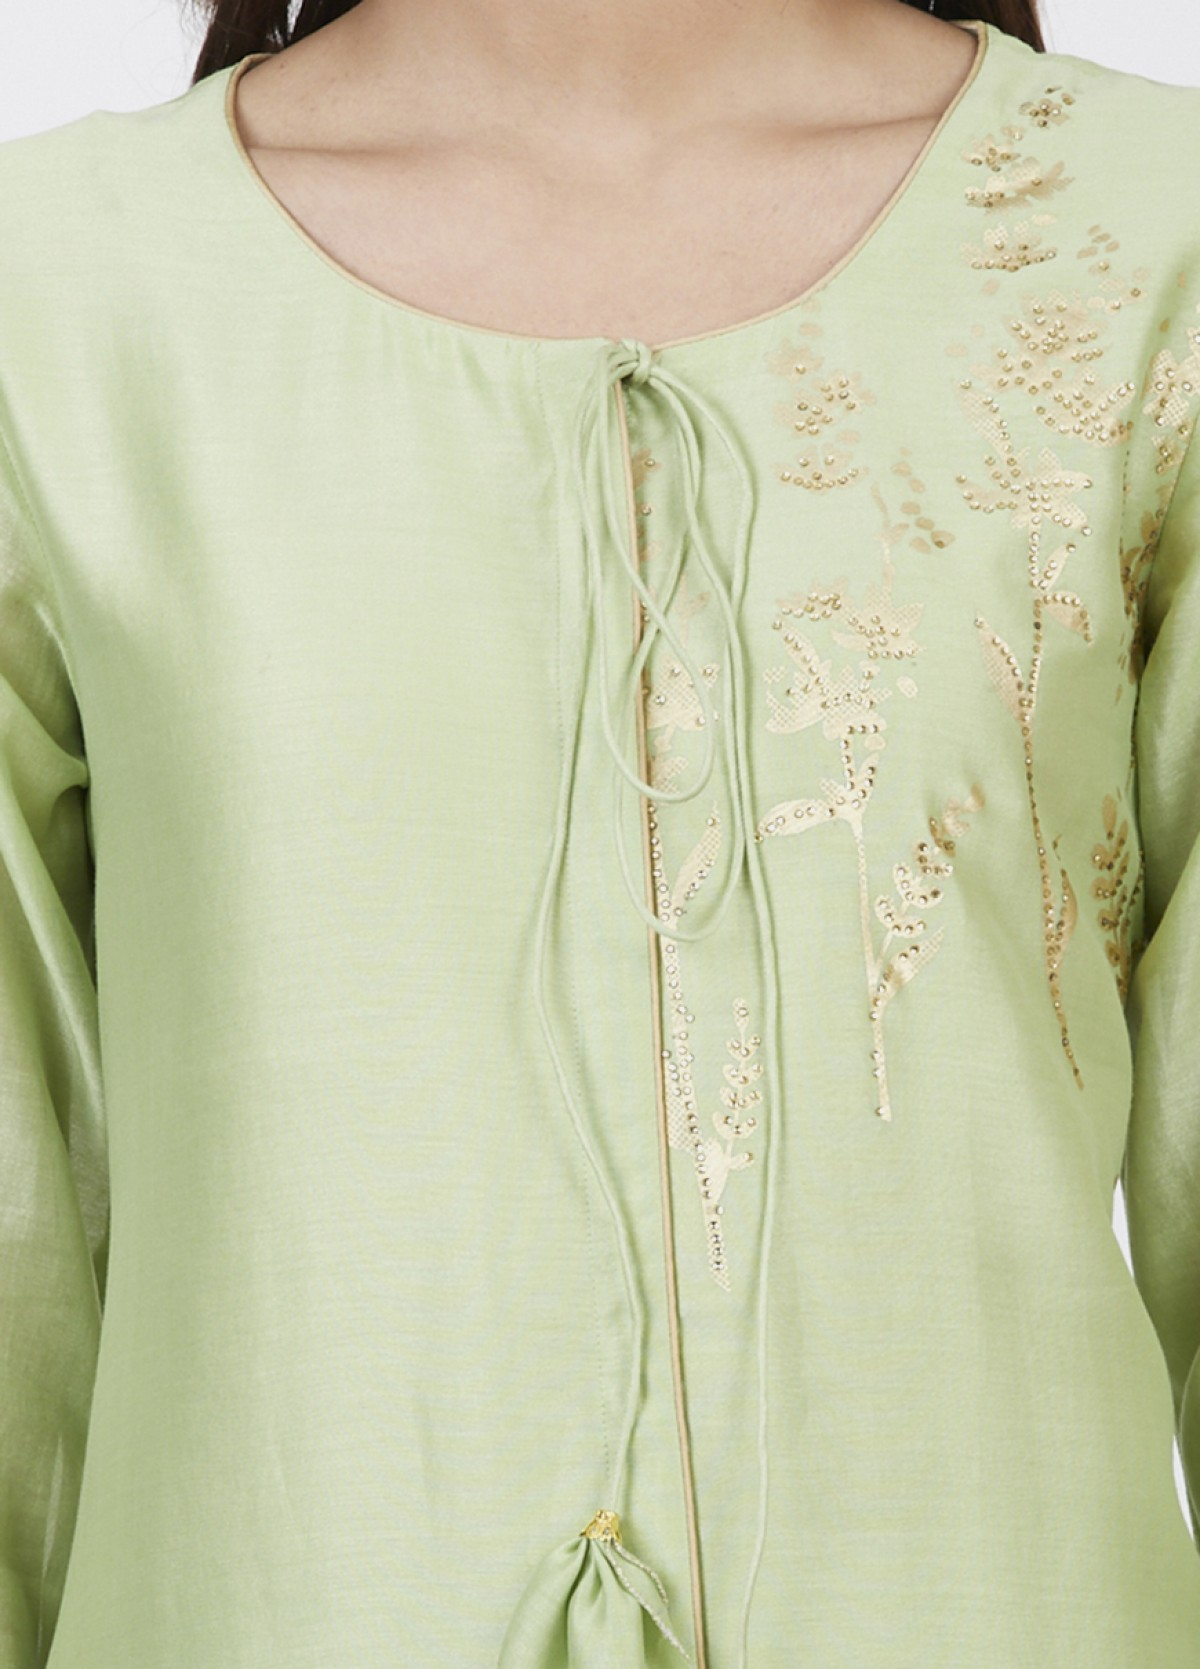 The Sprinkled Blossom Kurta Bottom Set